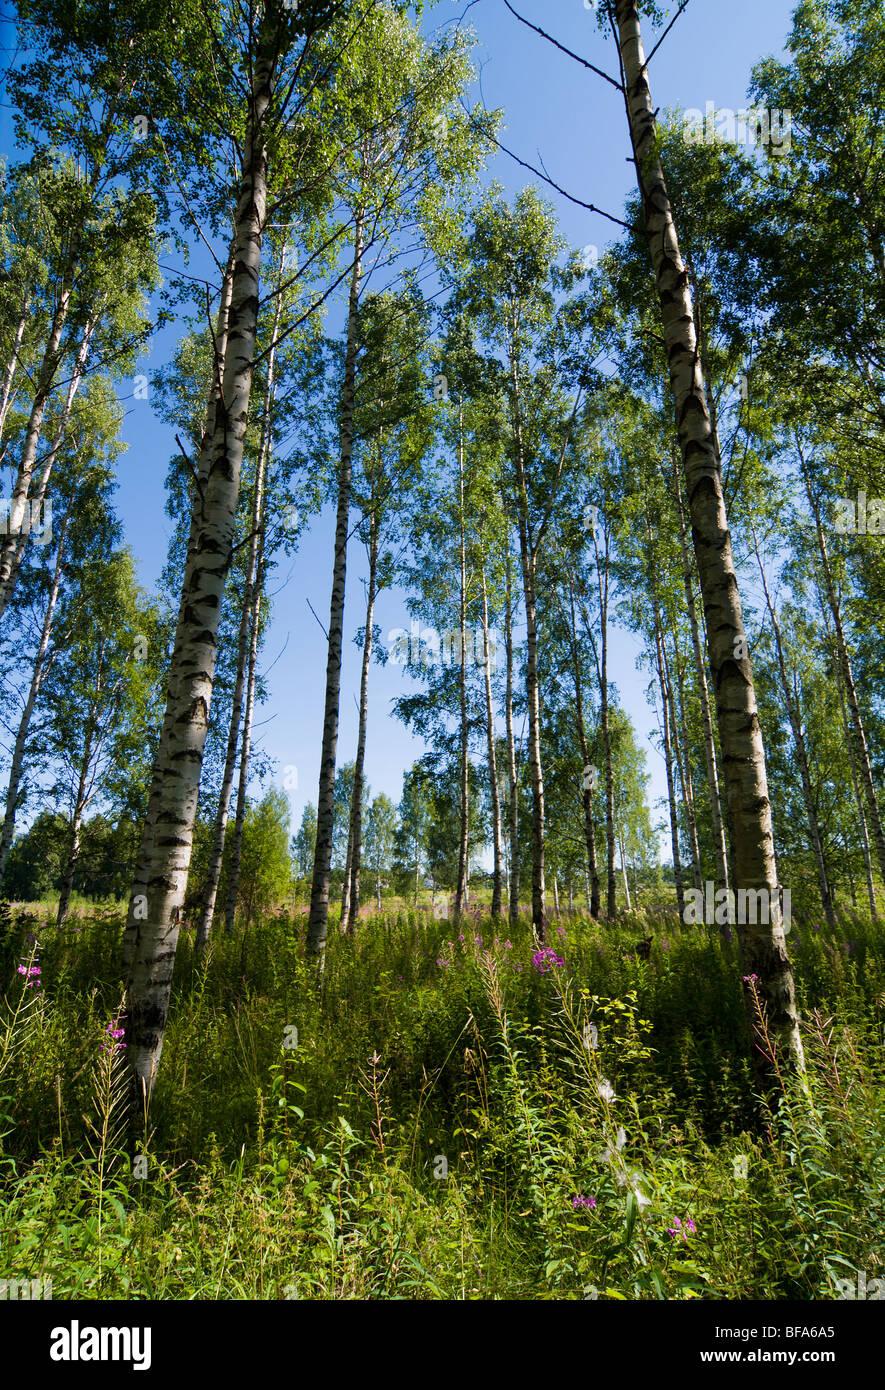 summer of Sweden - Stock Image